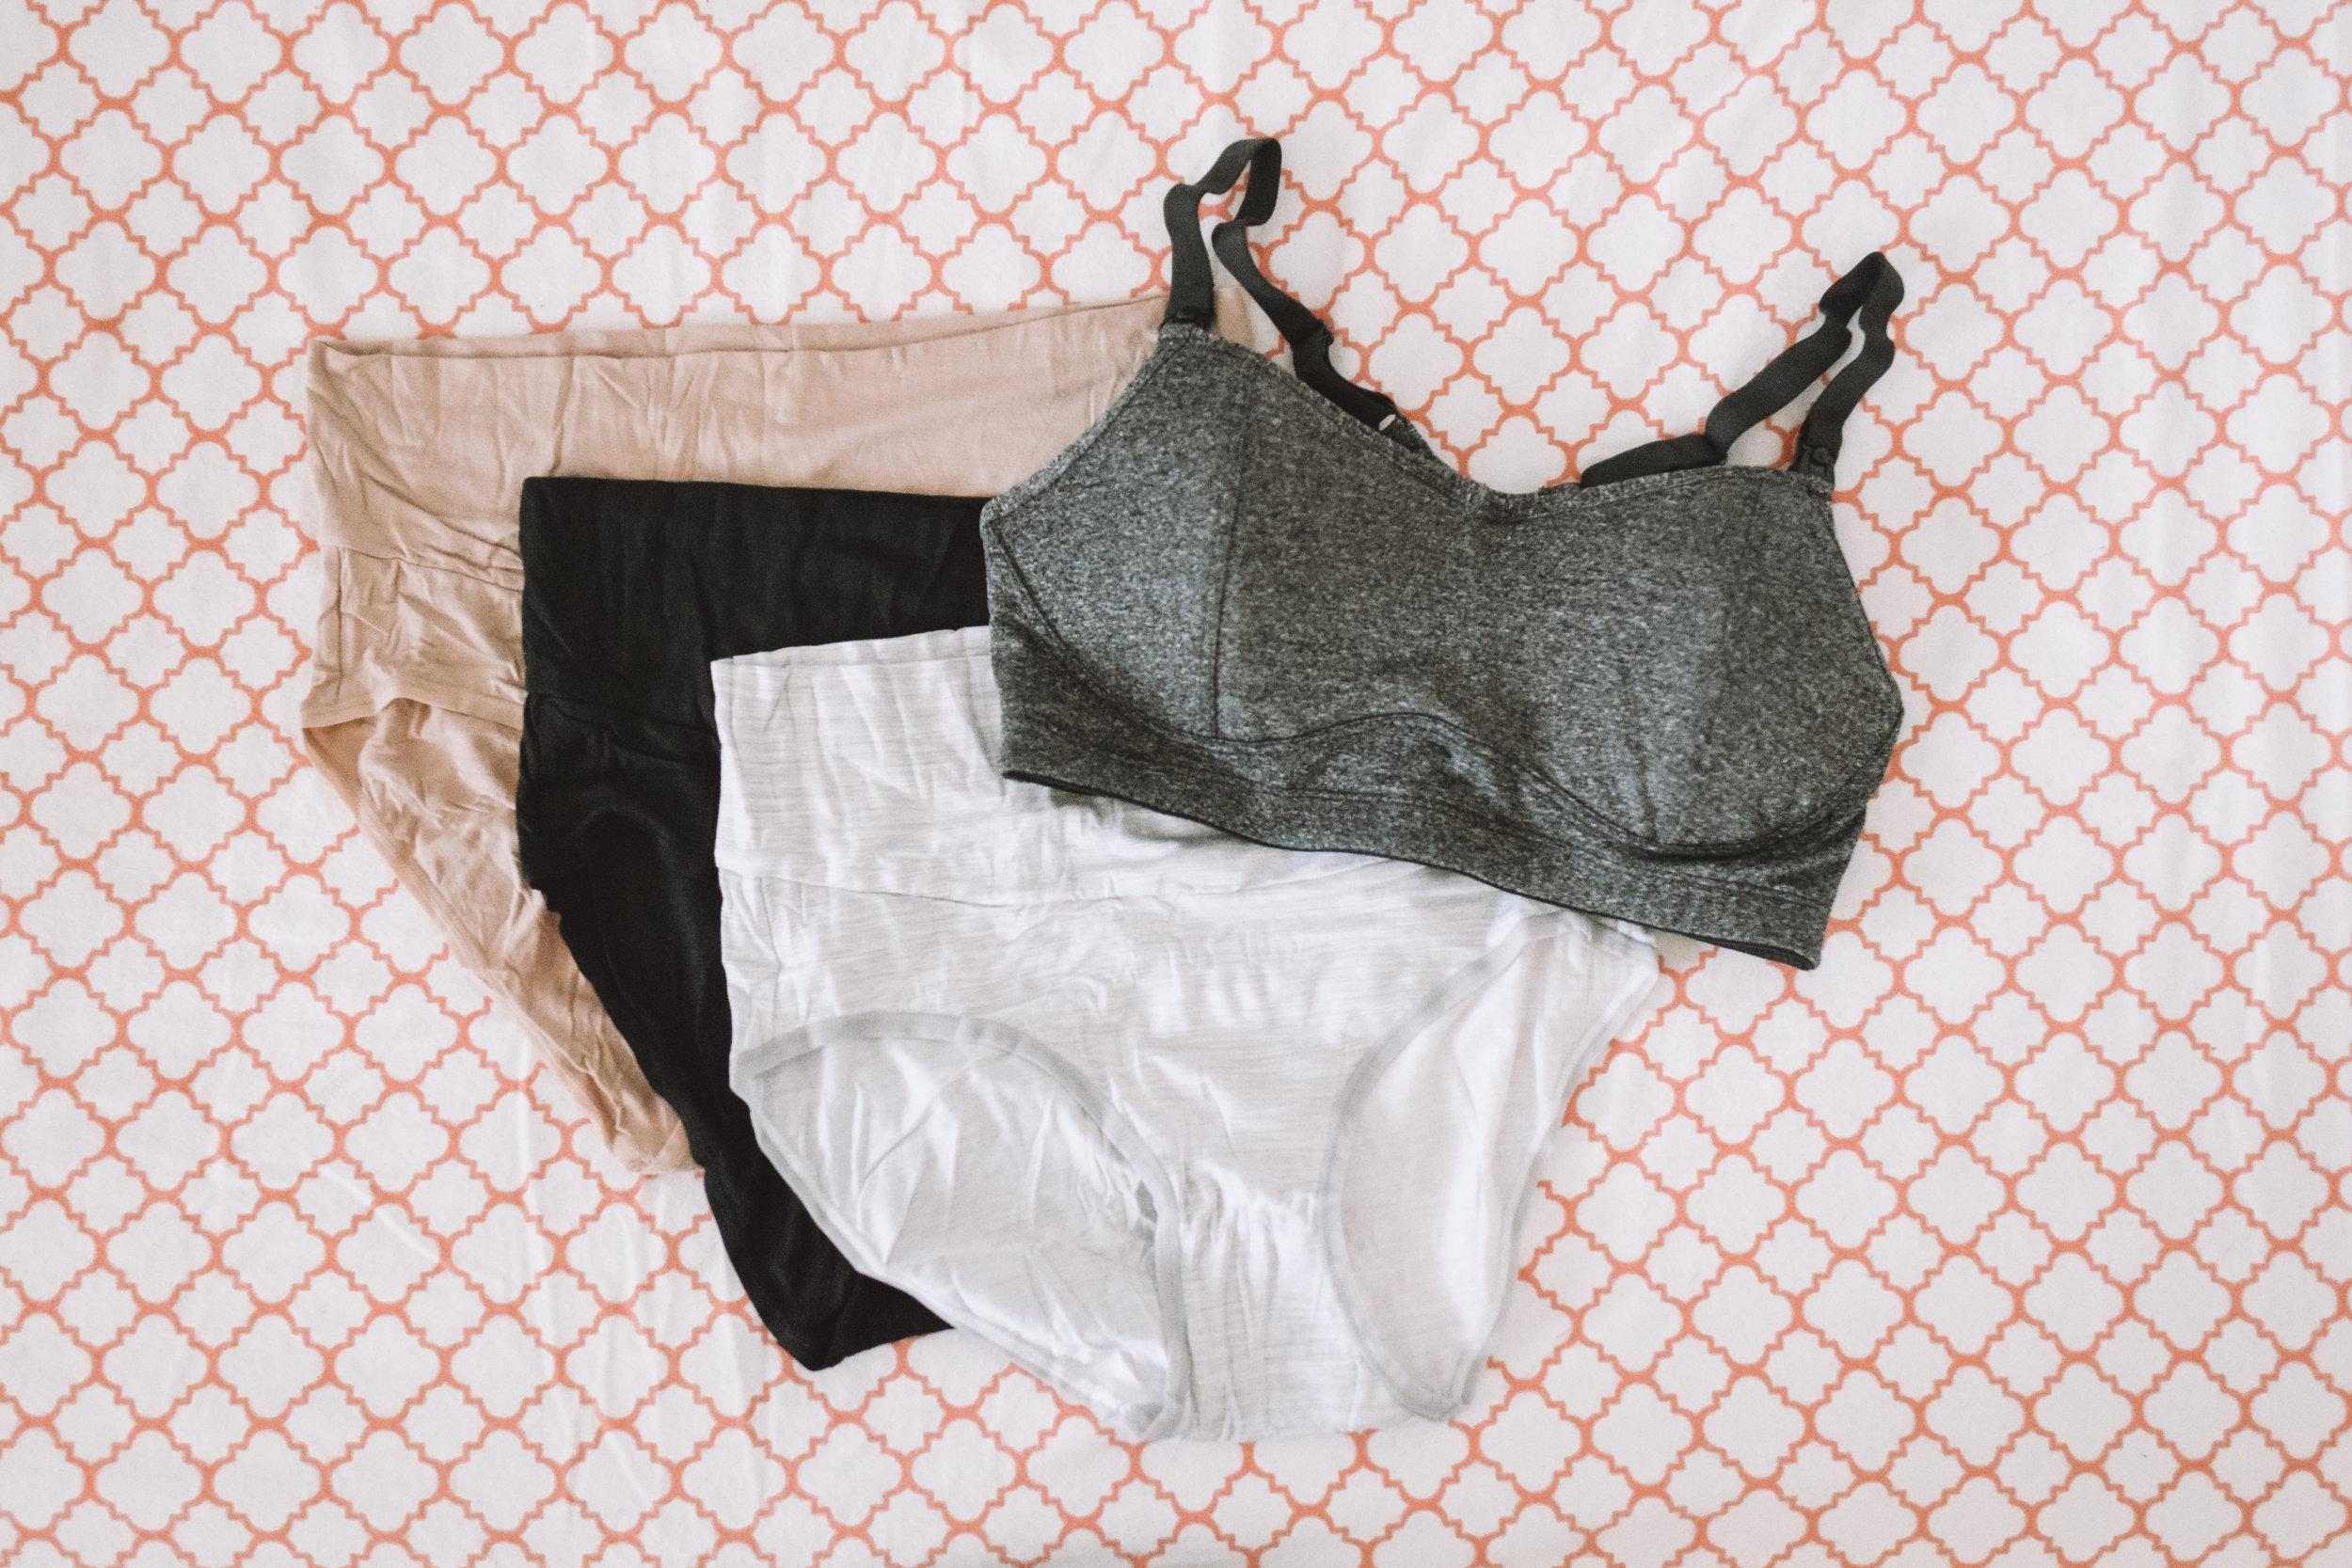 Best Soft Maternity Underwear - Best Maternity Nursing Sports Bra -- The Overwhelmed Mommy Blogger